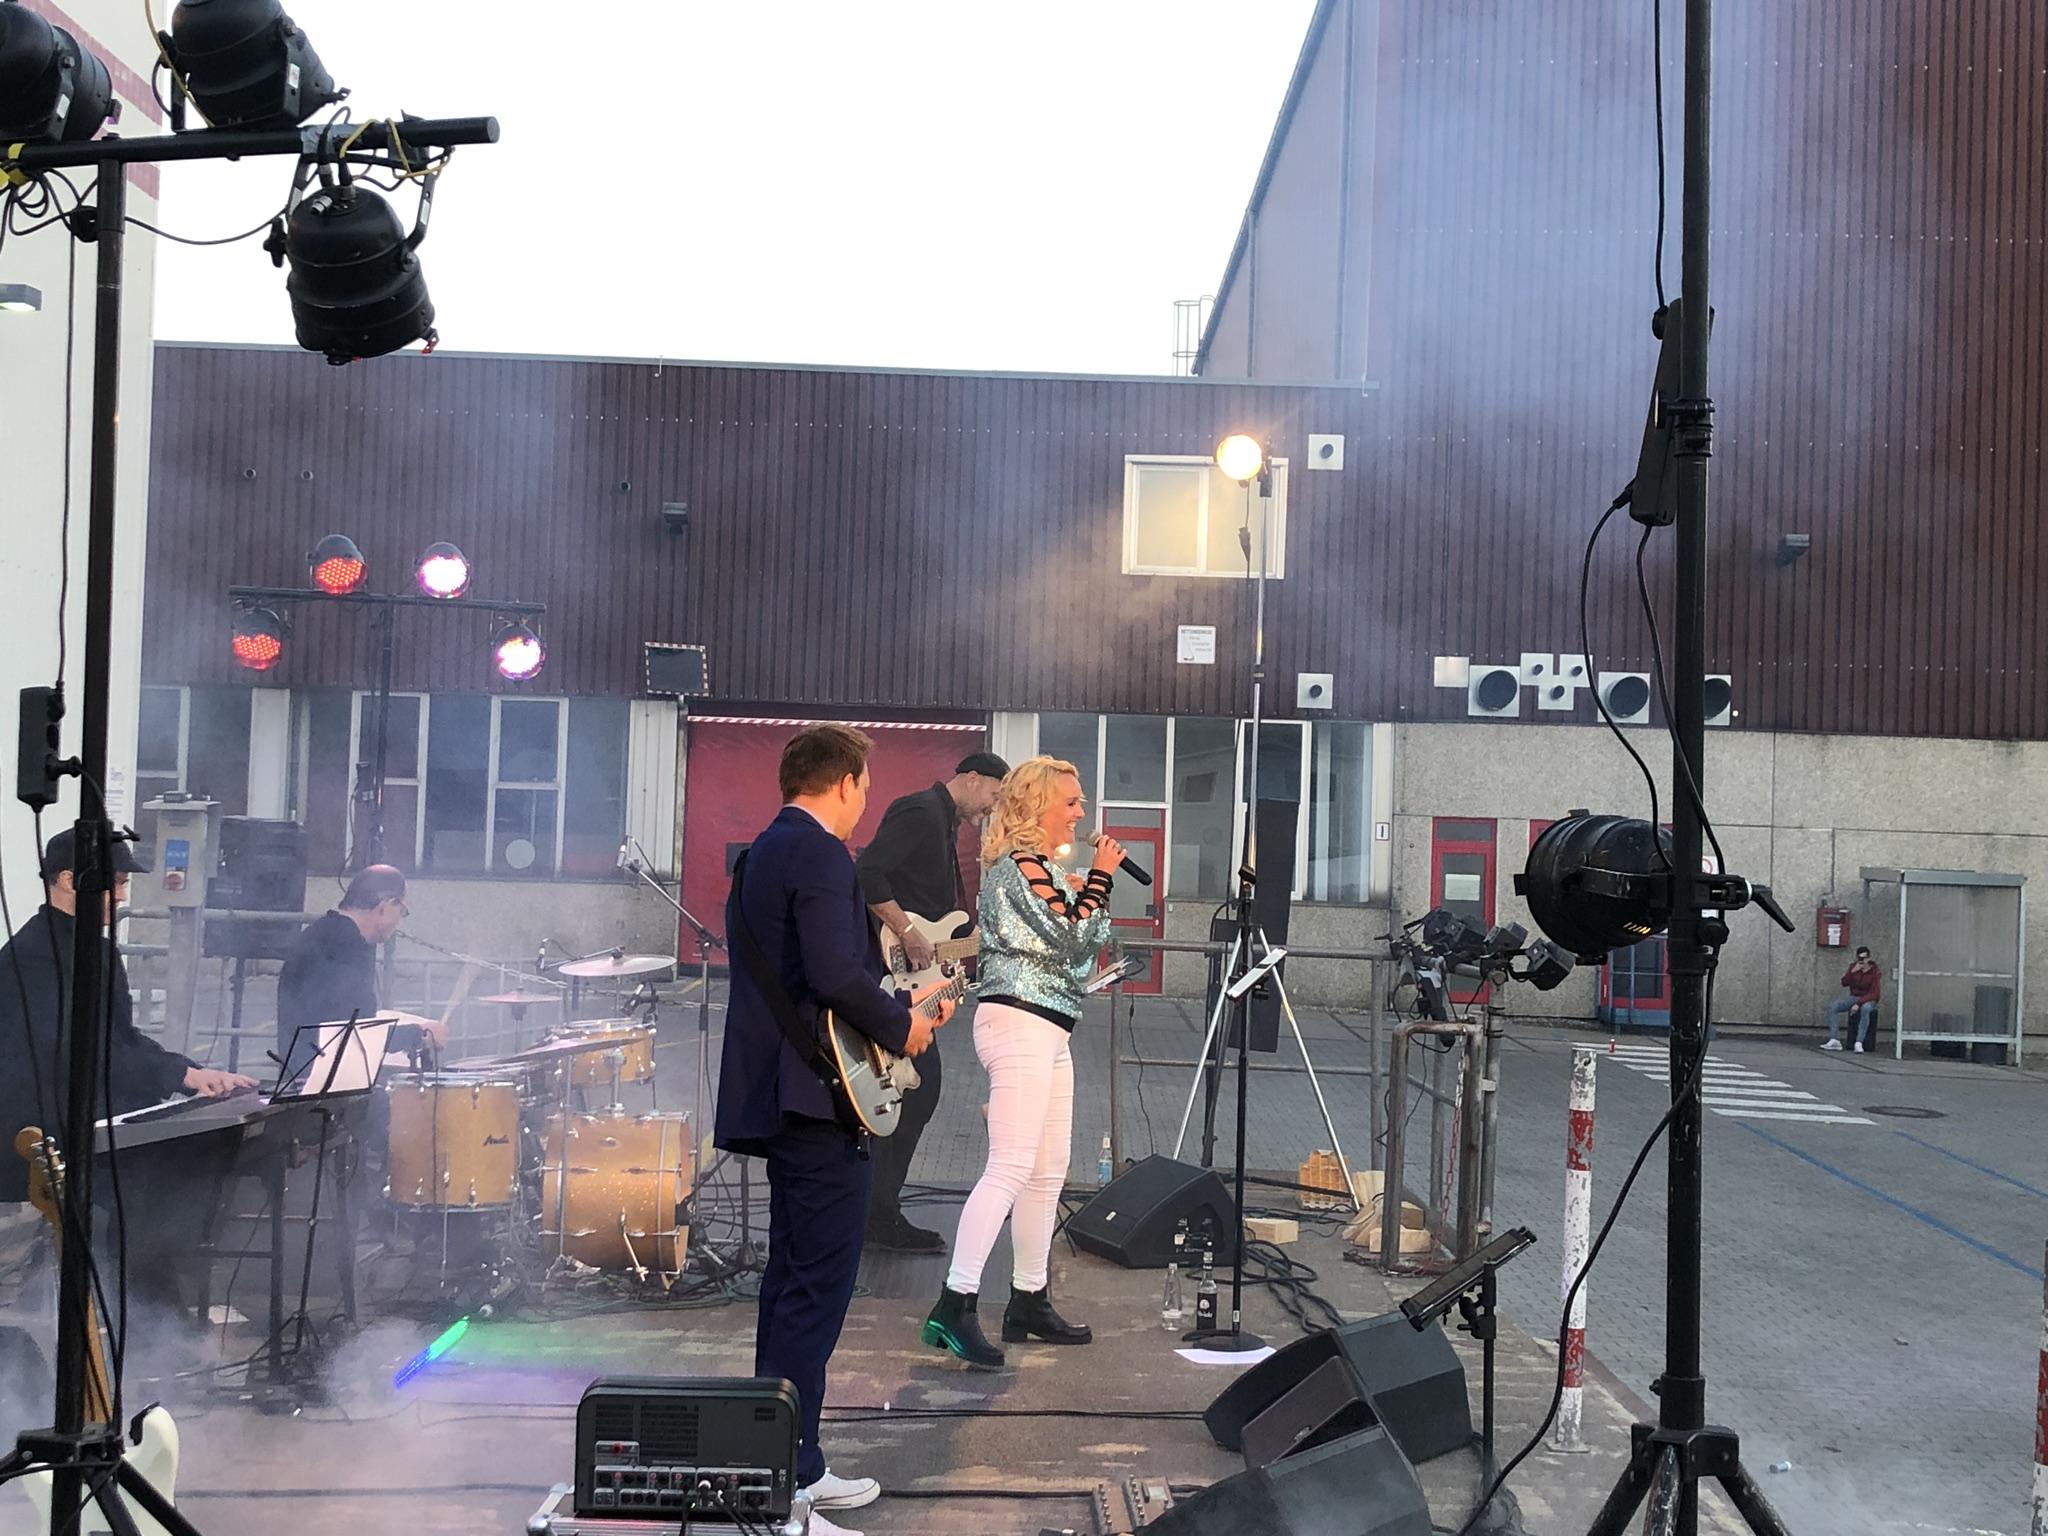 Partyband Sommerfest Berlin